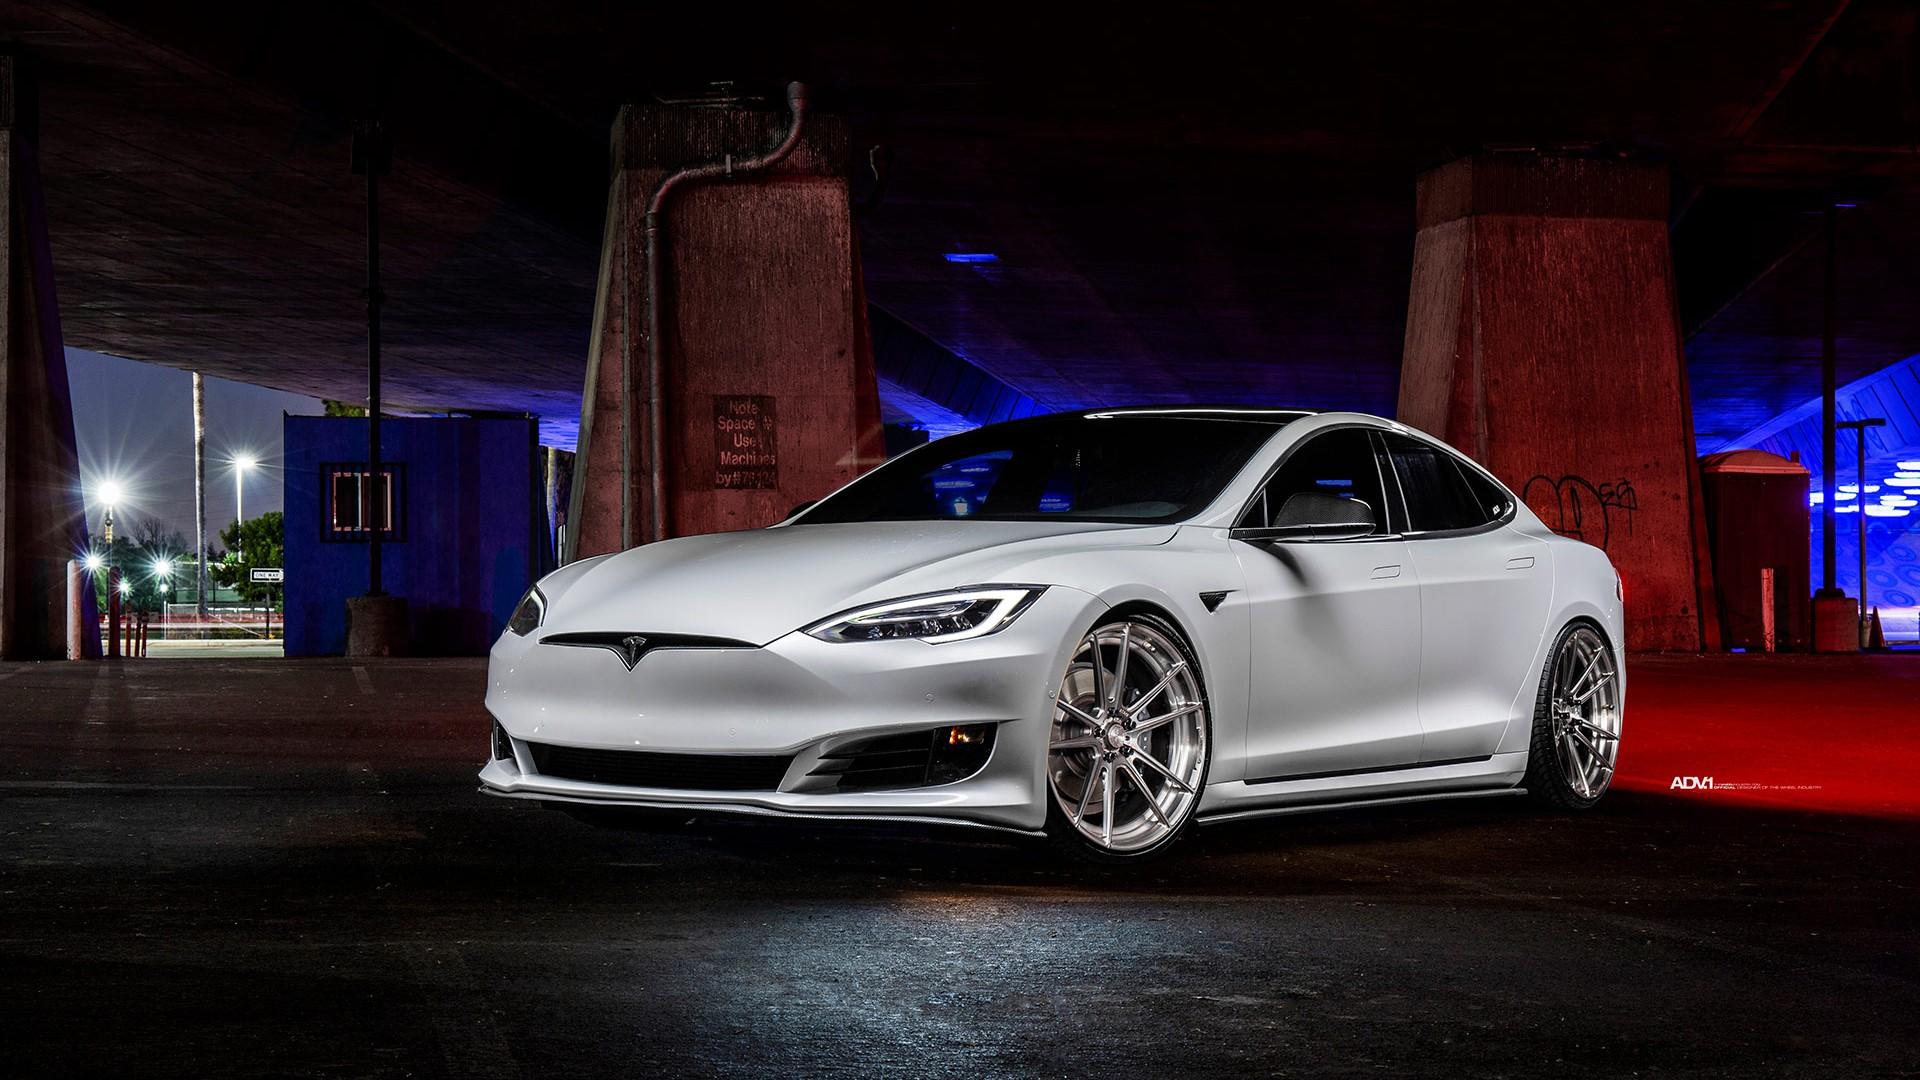 Bmw Car Pc Wallpapers White Tesla Model S Wallpaper Hd Car Wallpapers Id 10967